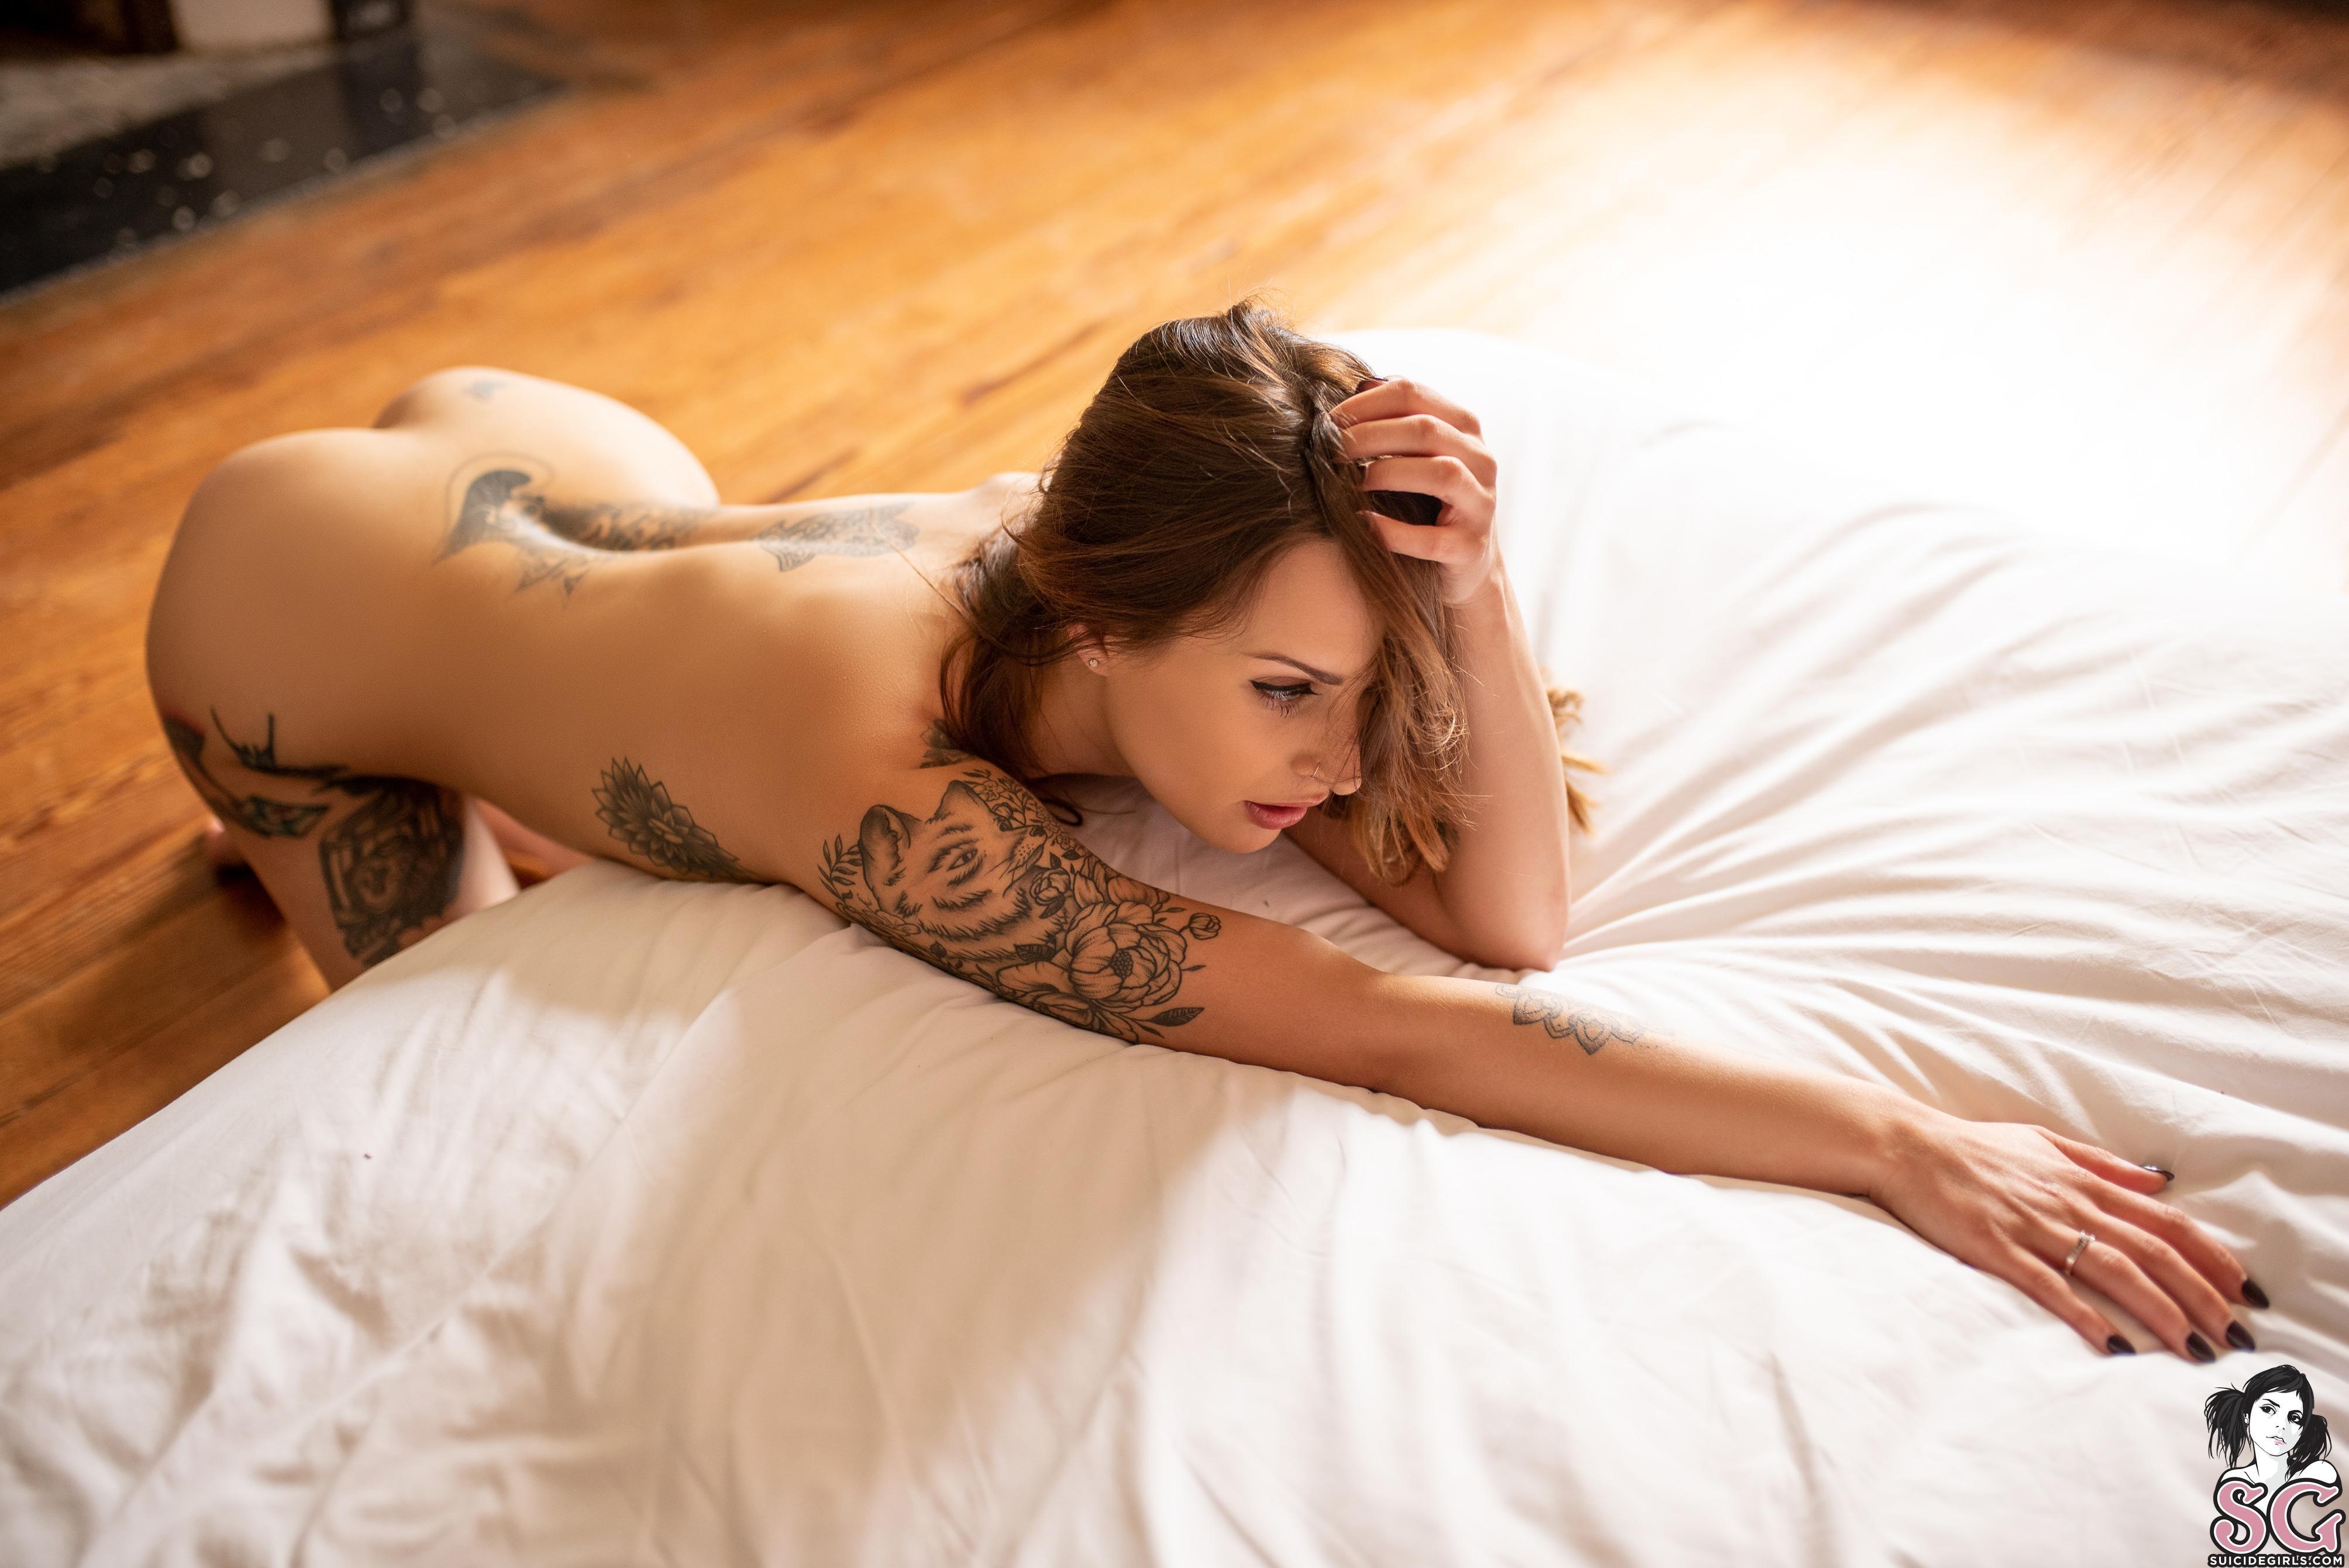 Helena Rae Nude Photos, Tattooed Body